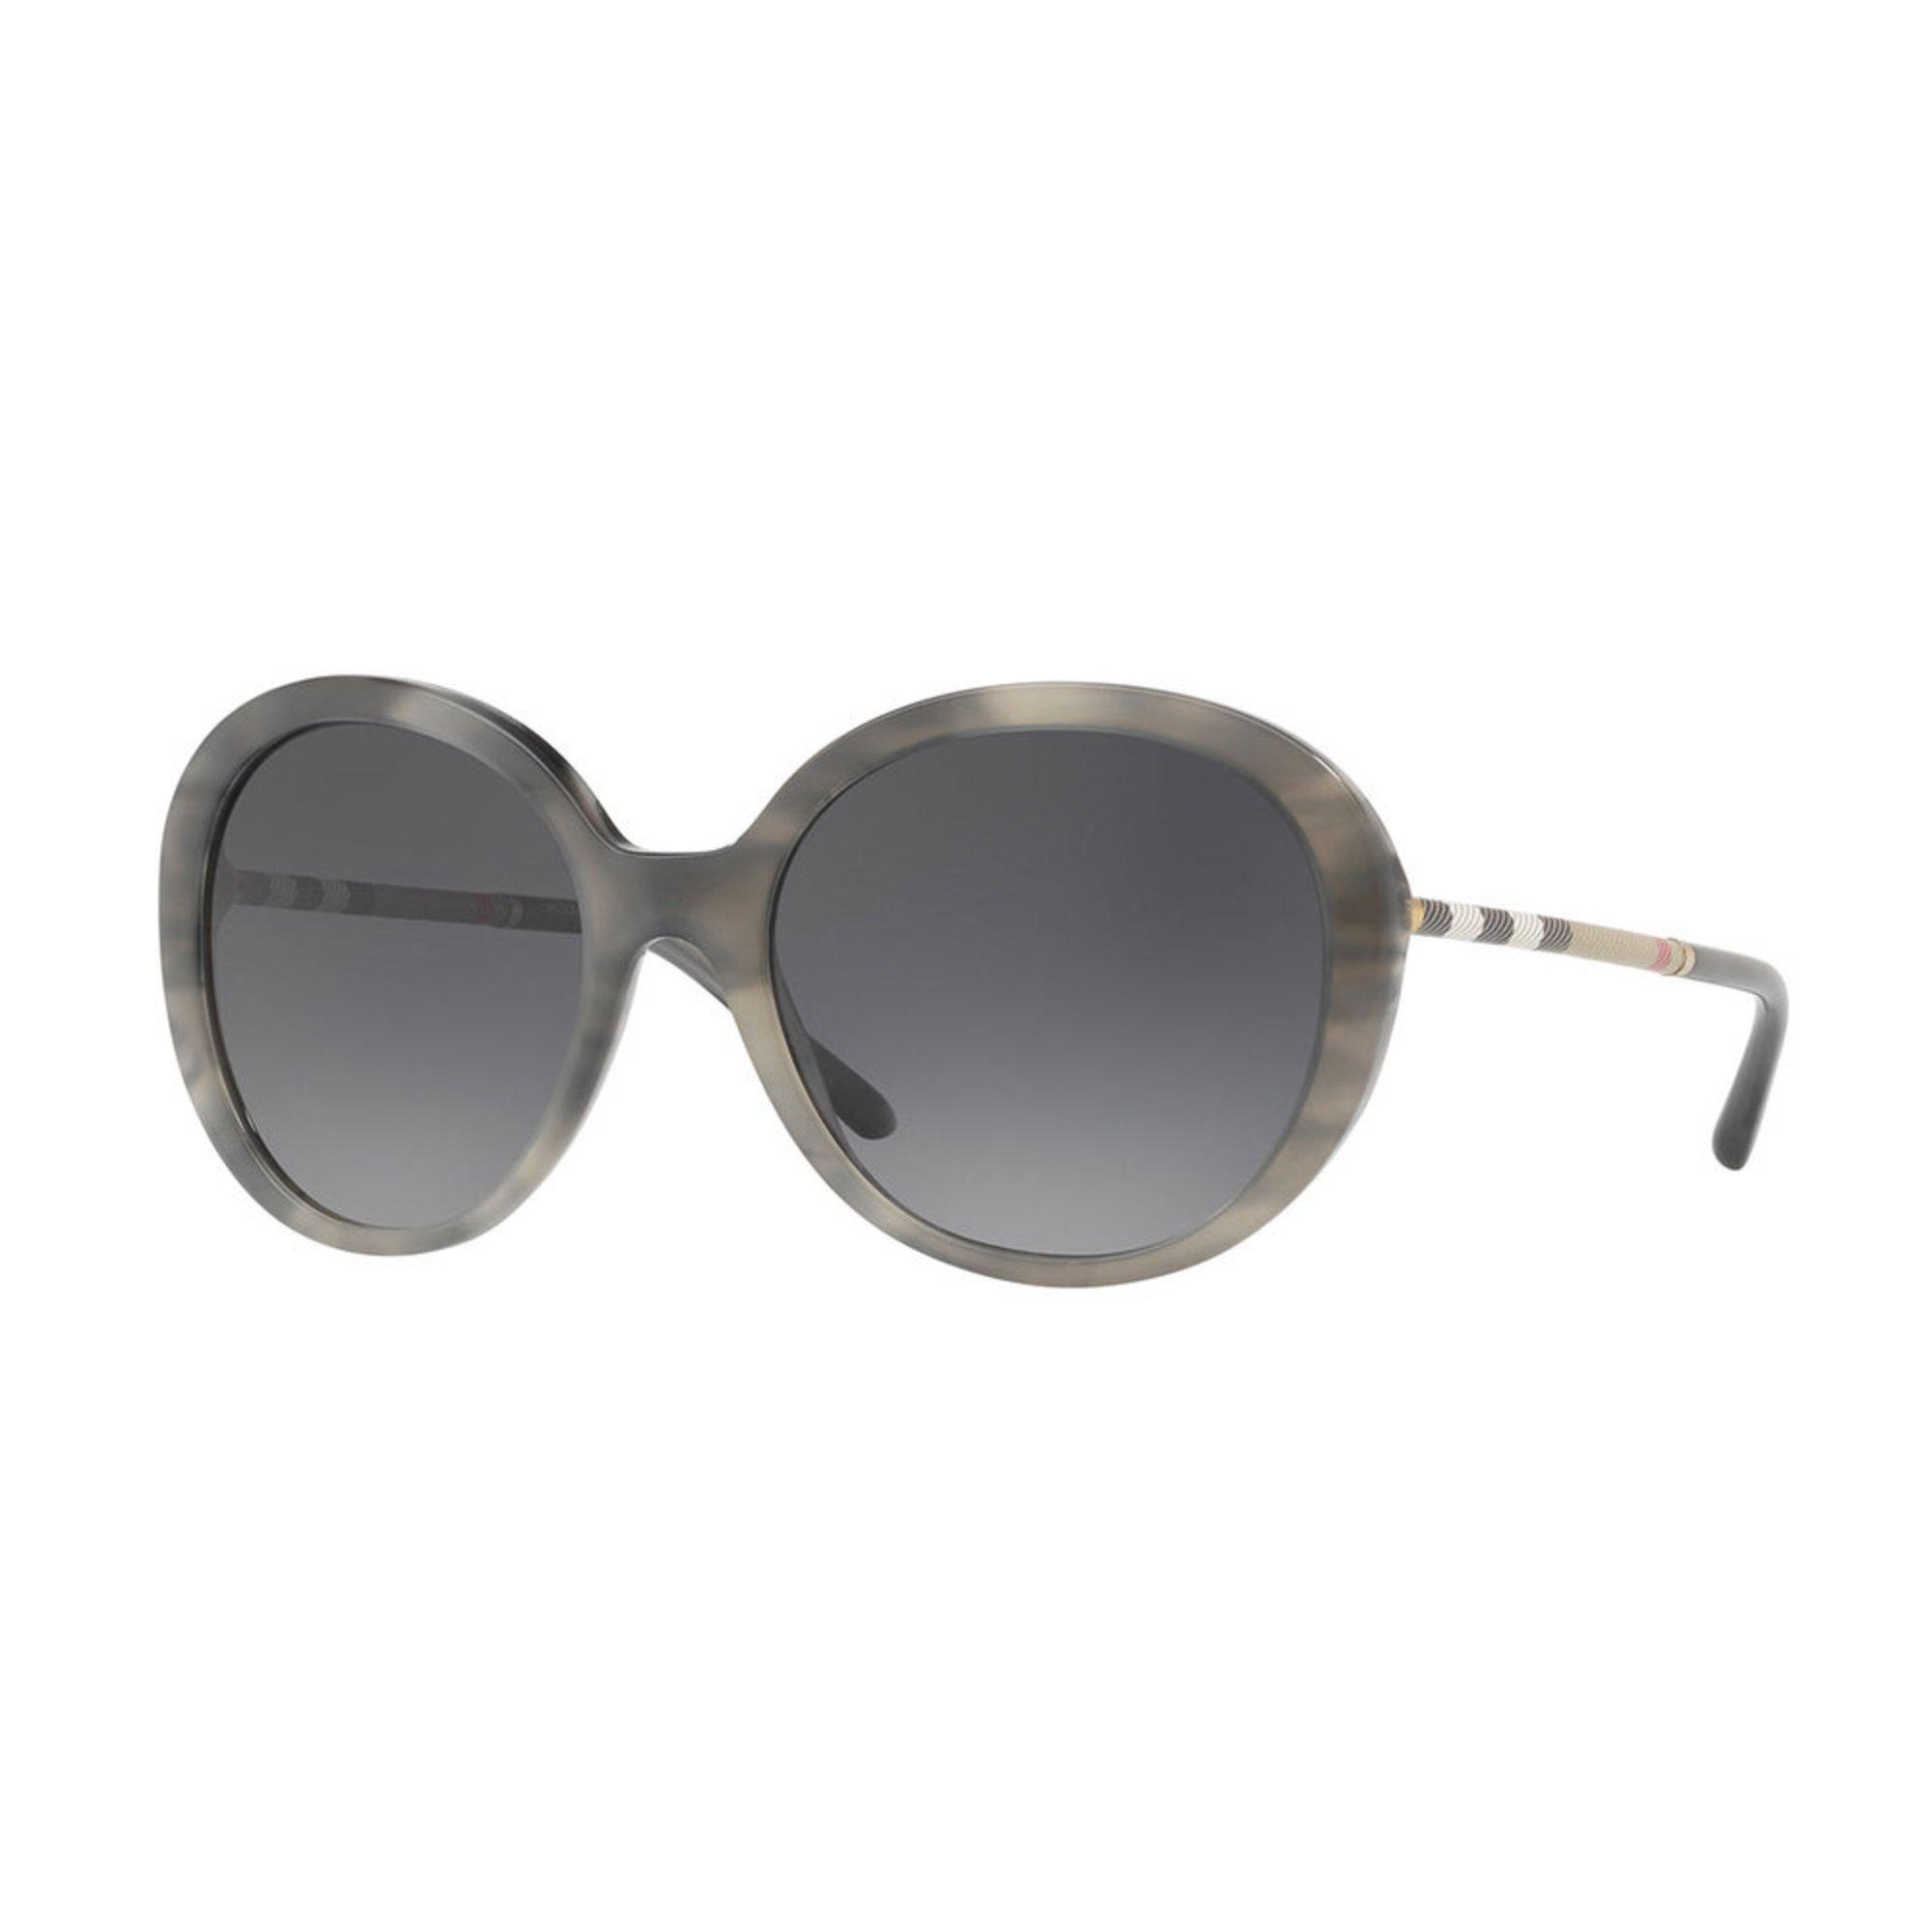 9f5f516b49 Burberry. Burberry Women s Round Sunglasses